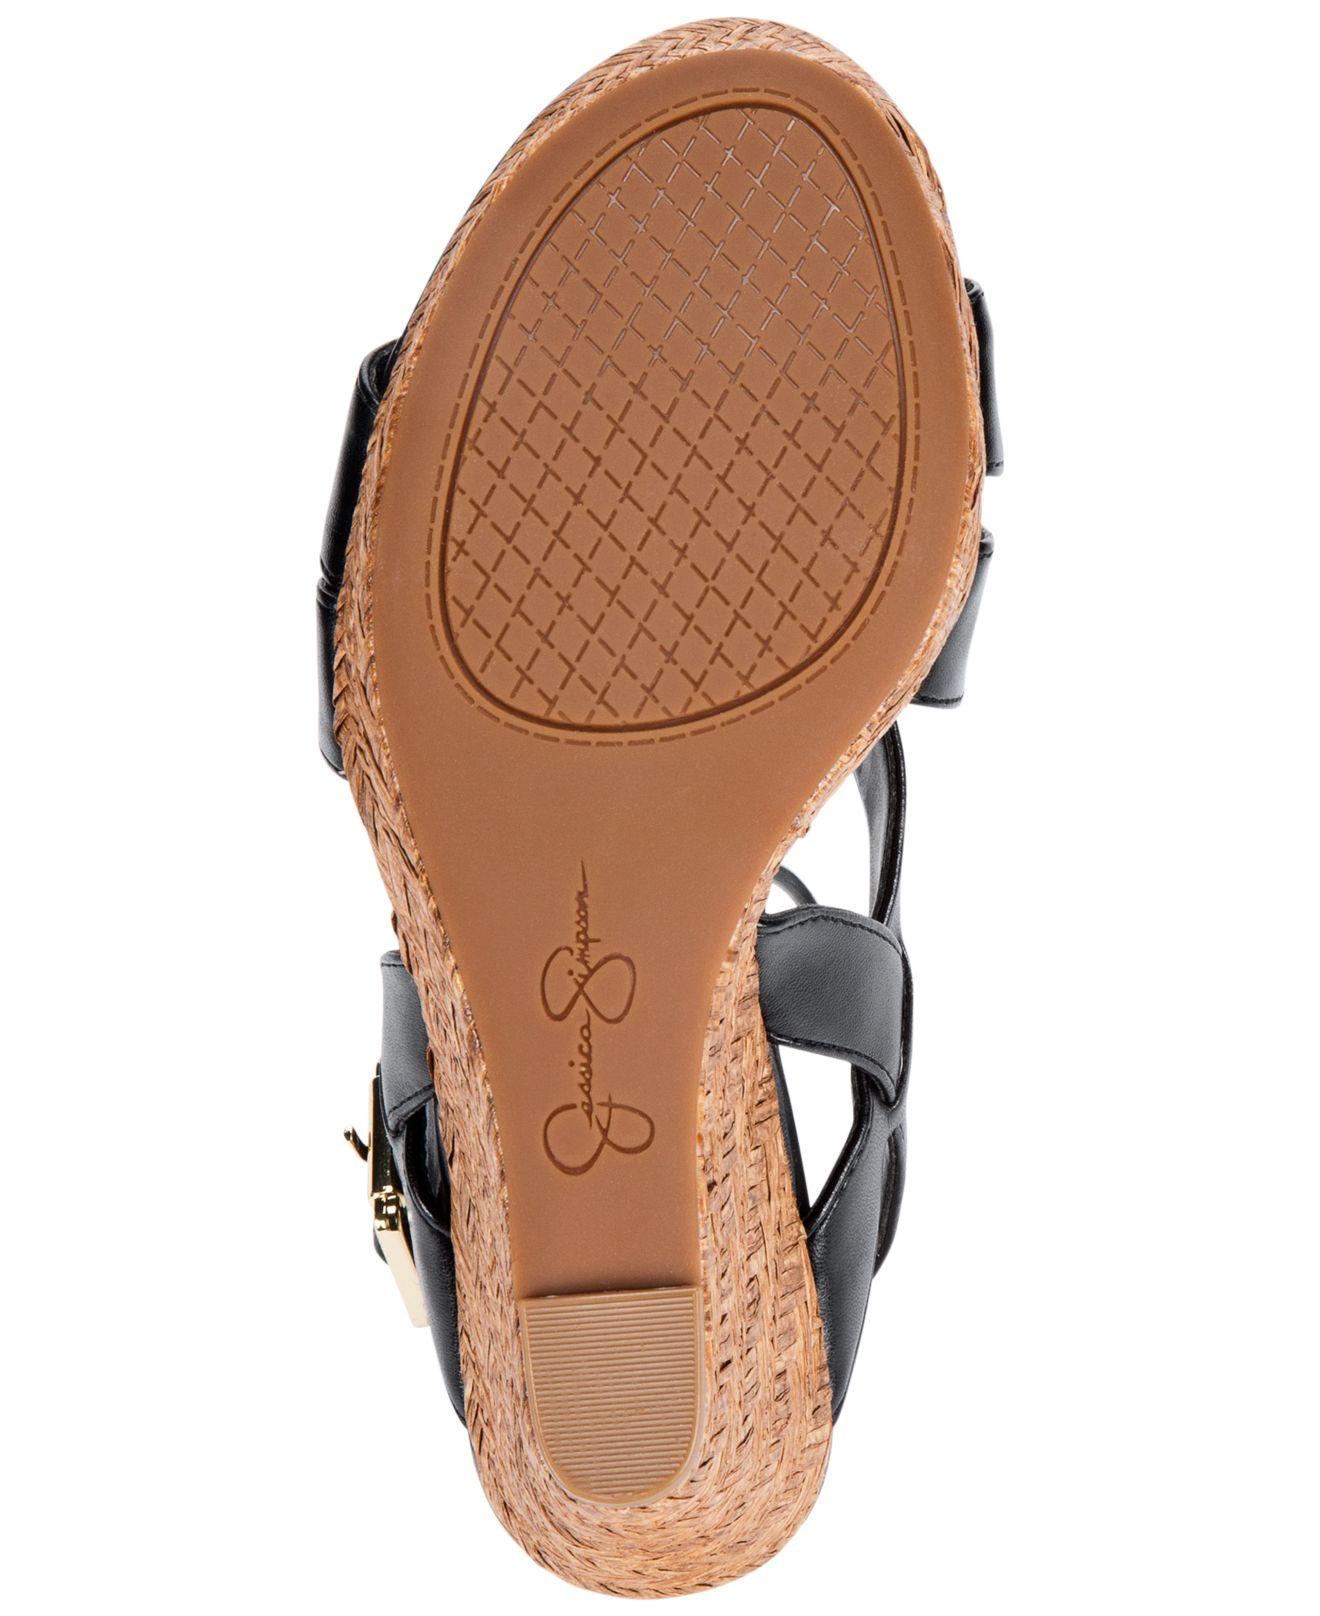 Lyst Jessica Simpson Jerrimo Platform Wedge Sandals In Black